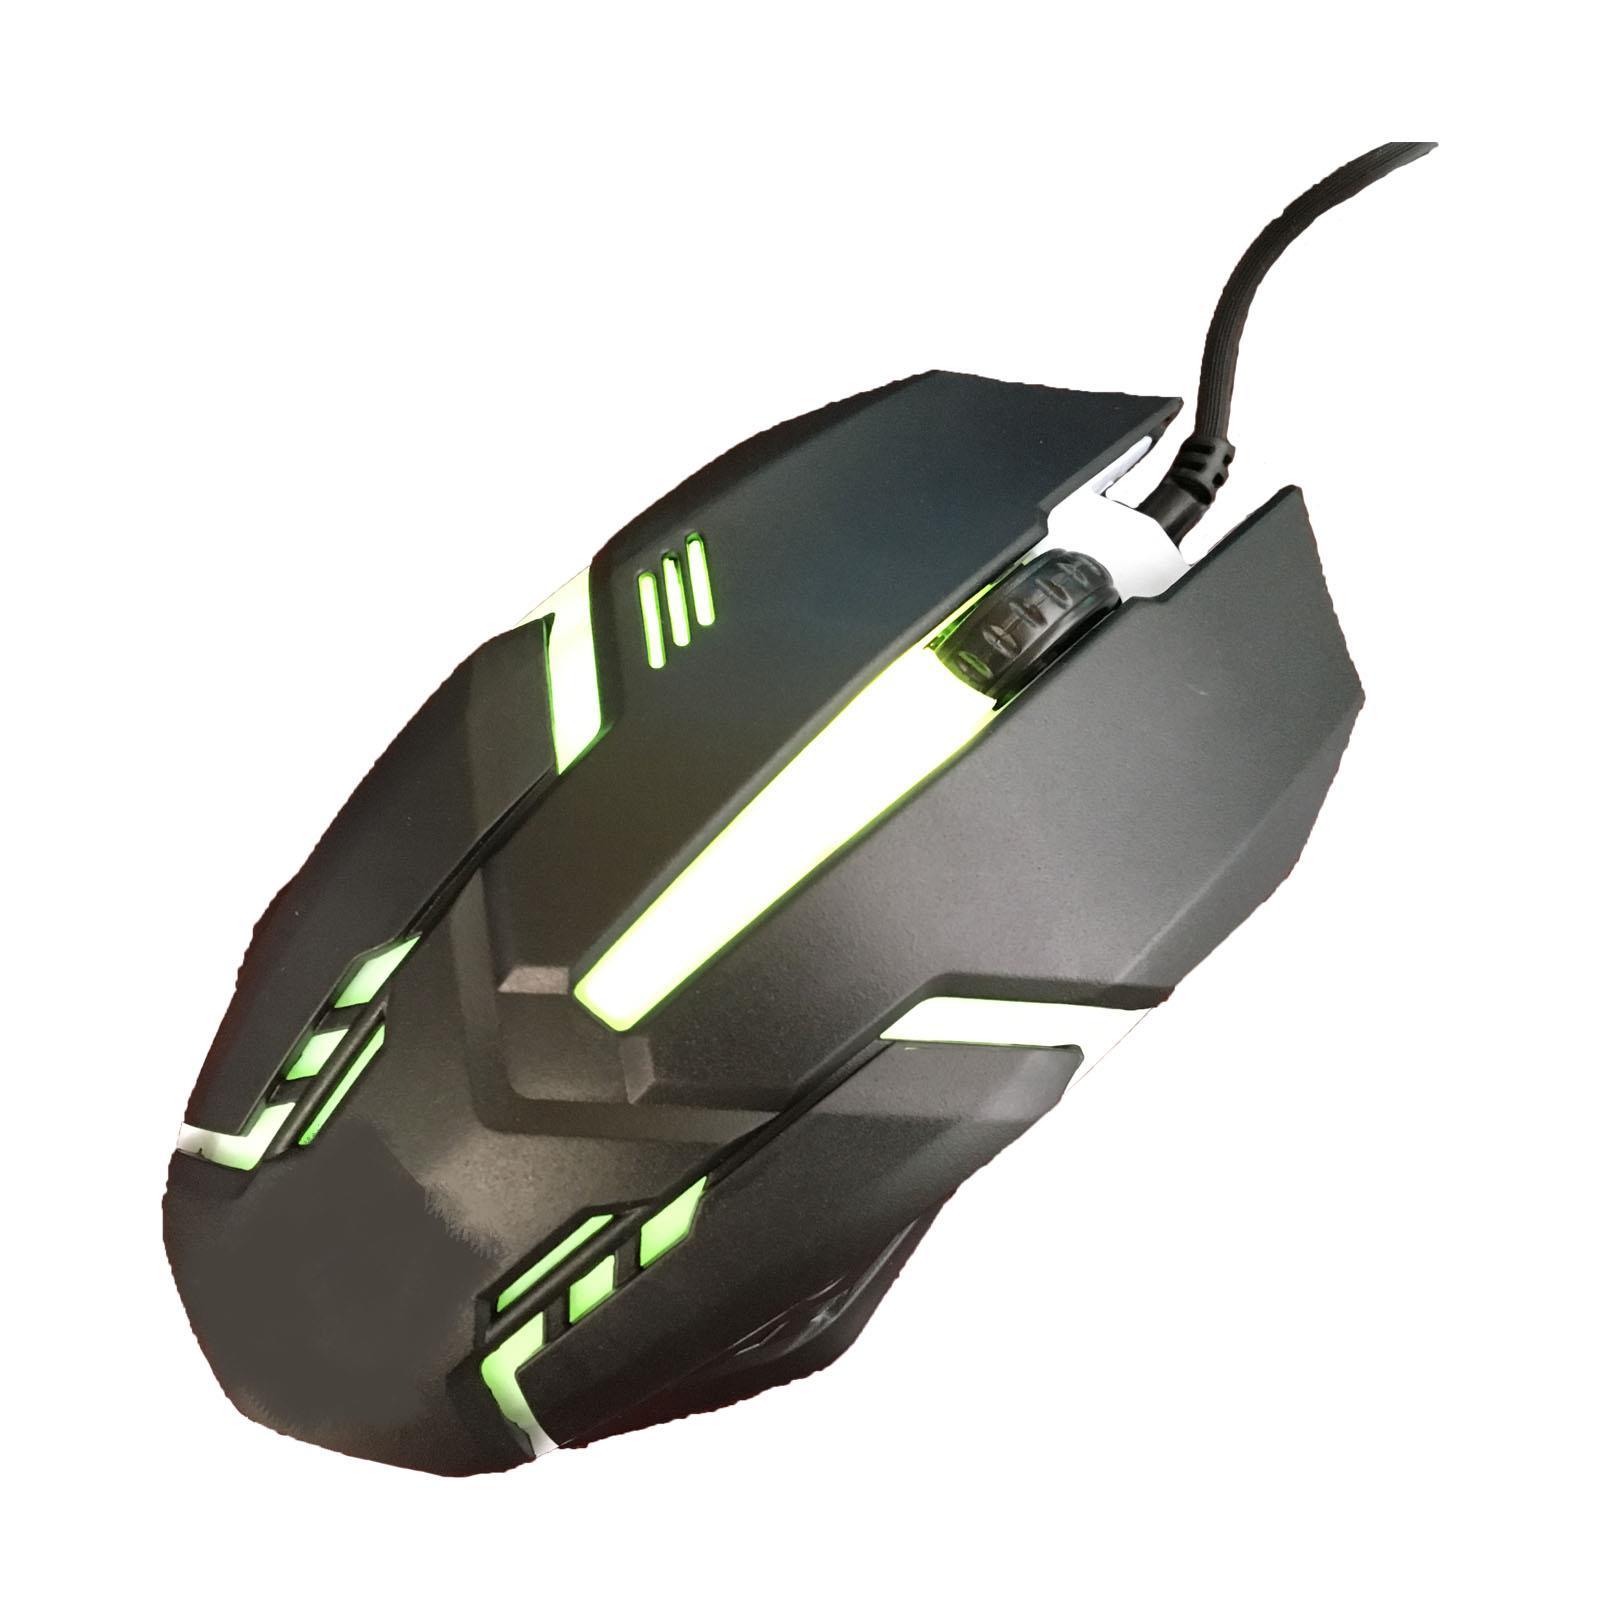 Gaming-Keyboard-Mouse-Backlit-Rainbow-LED-USB-Set-for-PC-Laptop-PS4-Xbox-One thumbnail 21